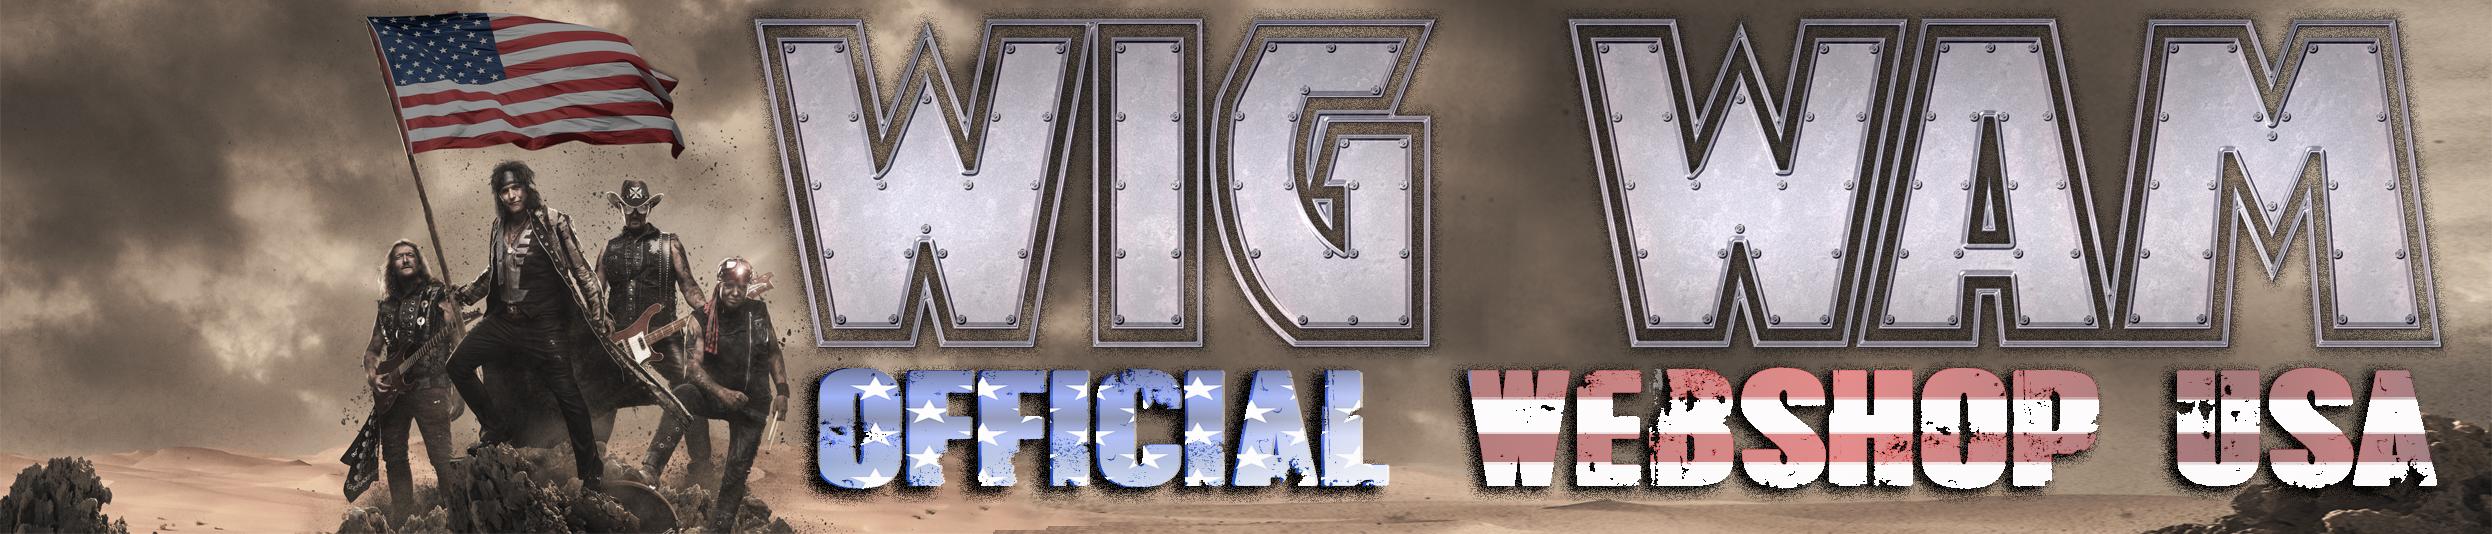 wig-wam-official-weshop-banner-usa.jpg